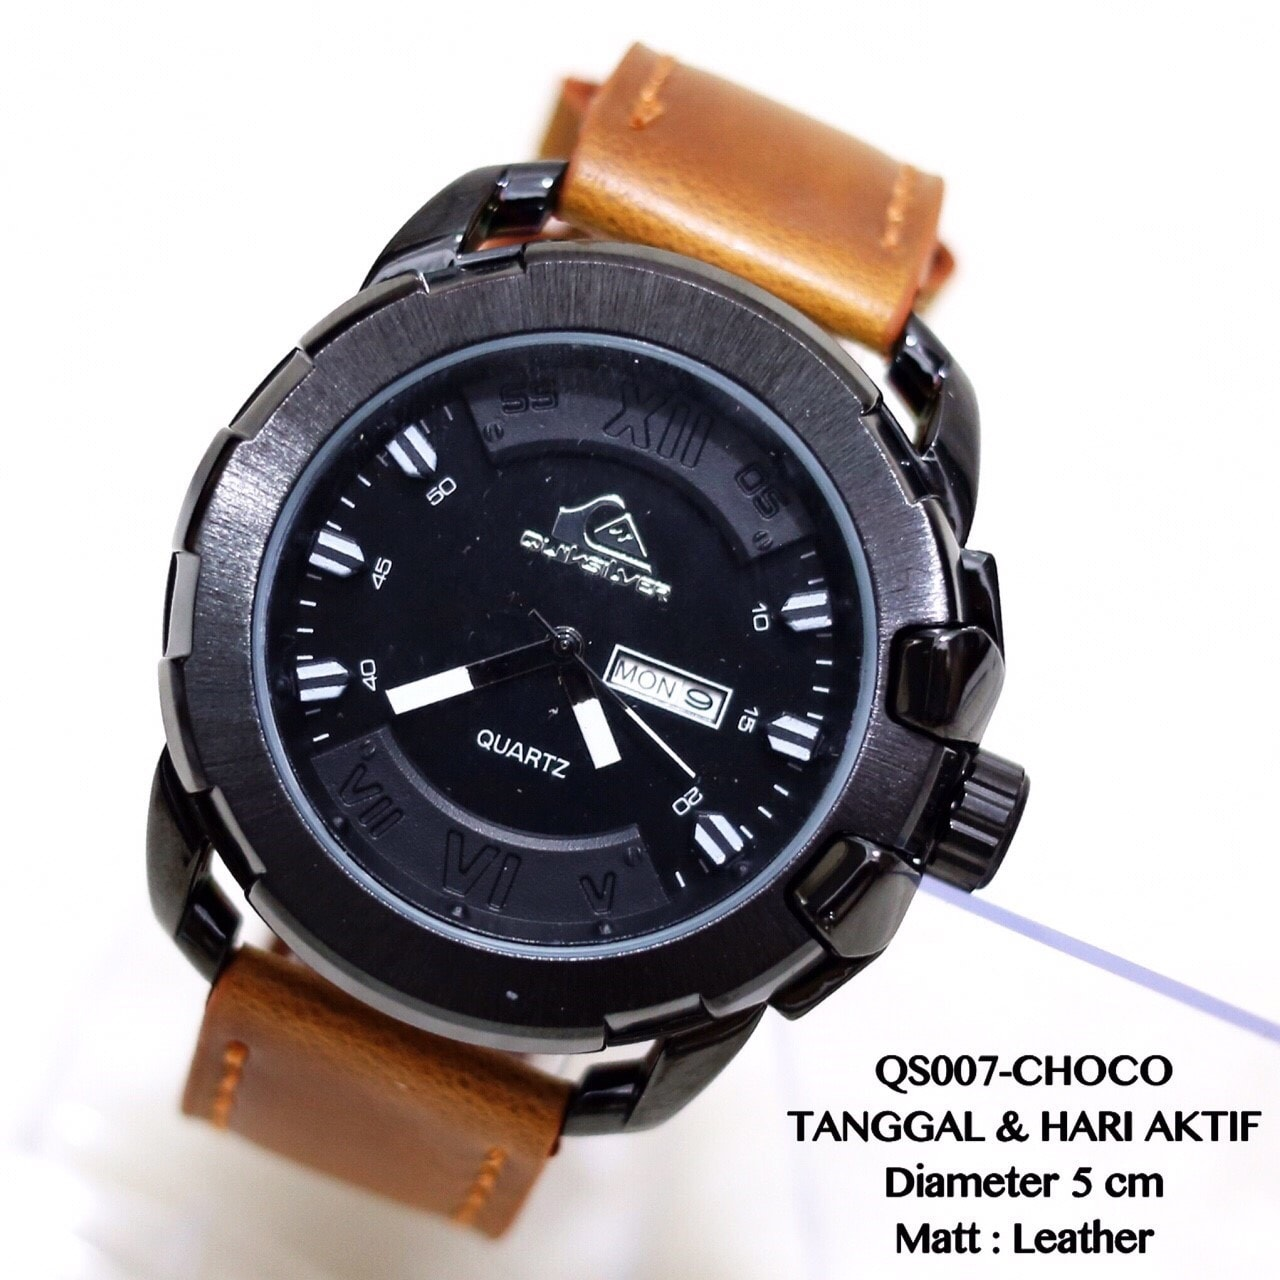 Jam tangan pria sporty QUICKSILVER supplier grosir termurah casual c82c29cd10